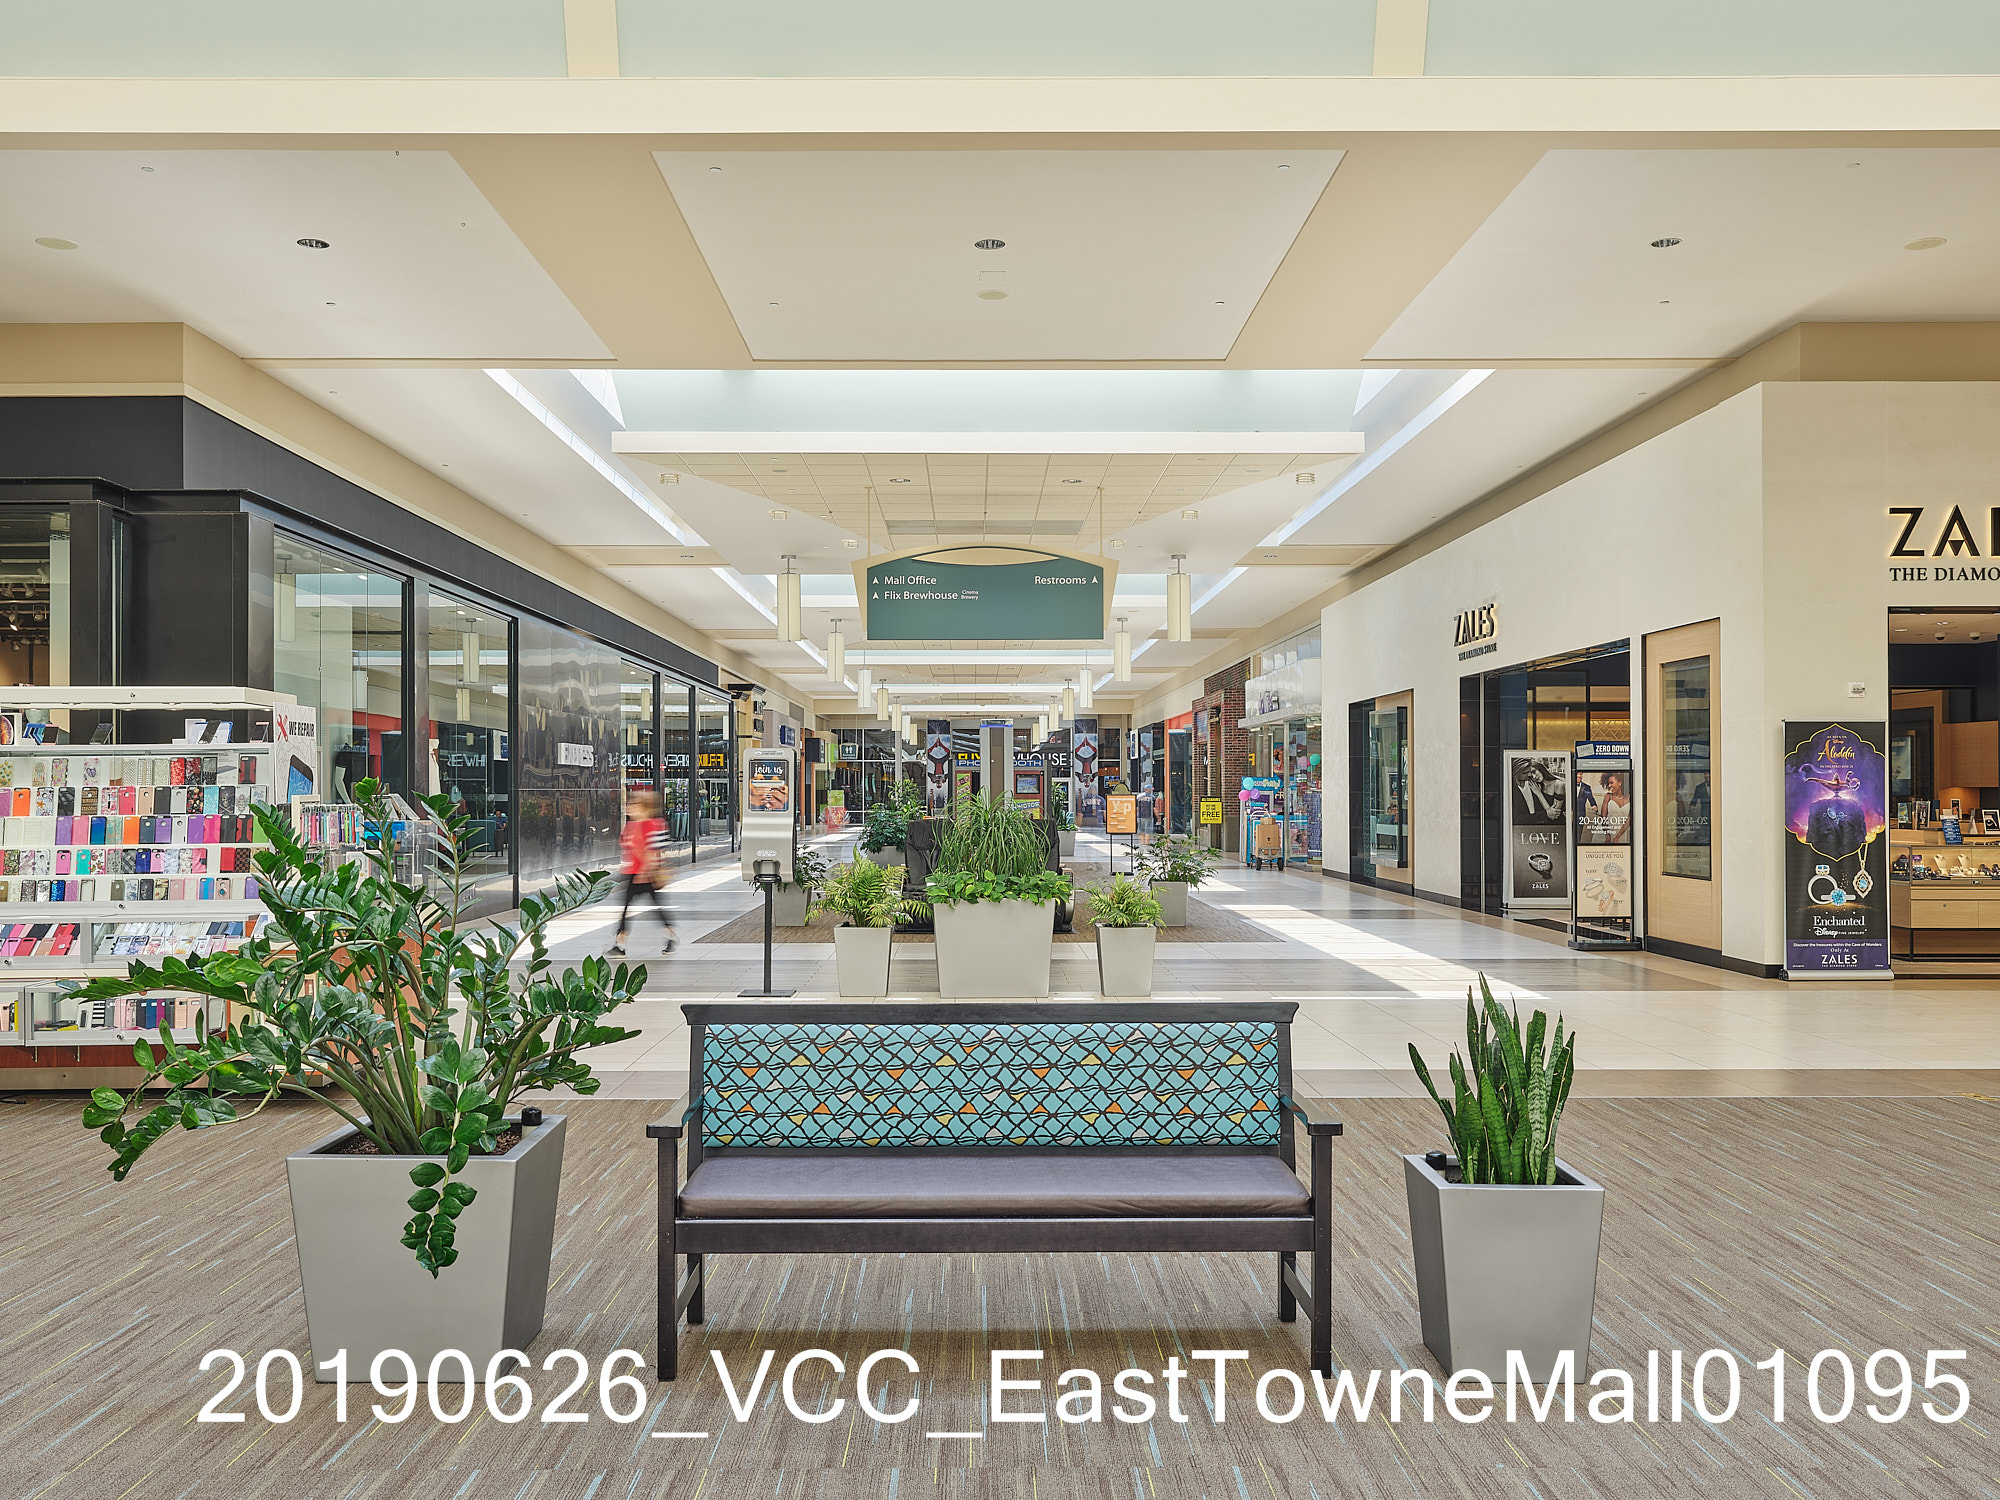 20190626_VCC_EastTowneMall01095.jpg